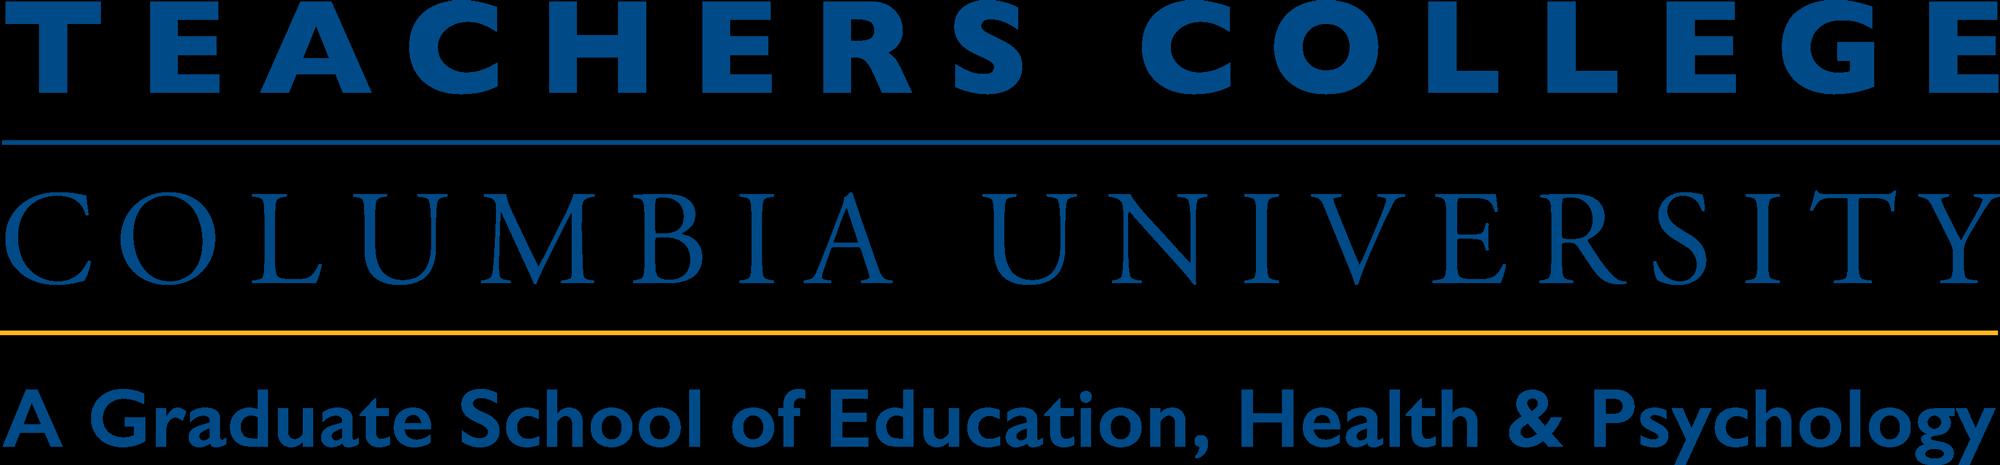 teachers-college-columbia-logo